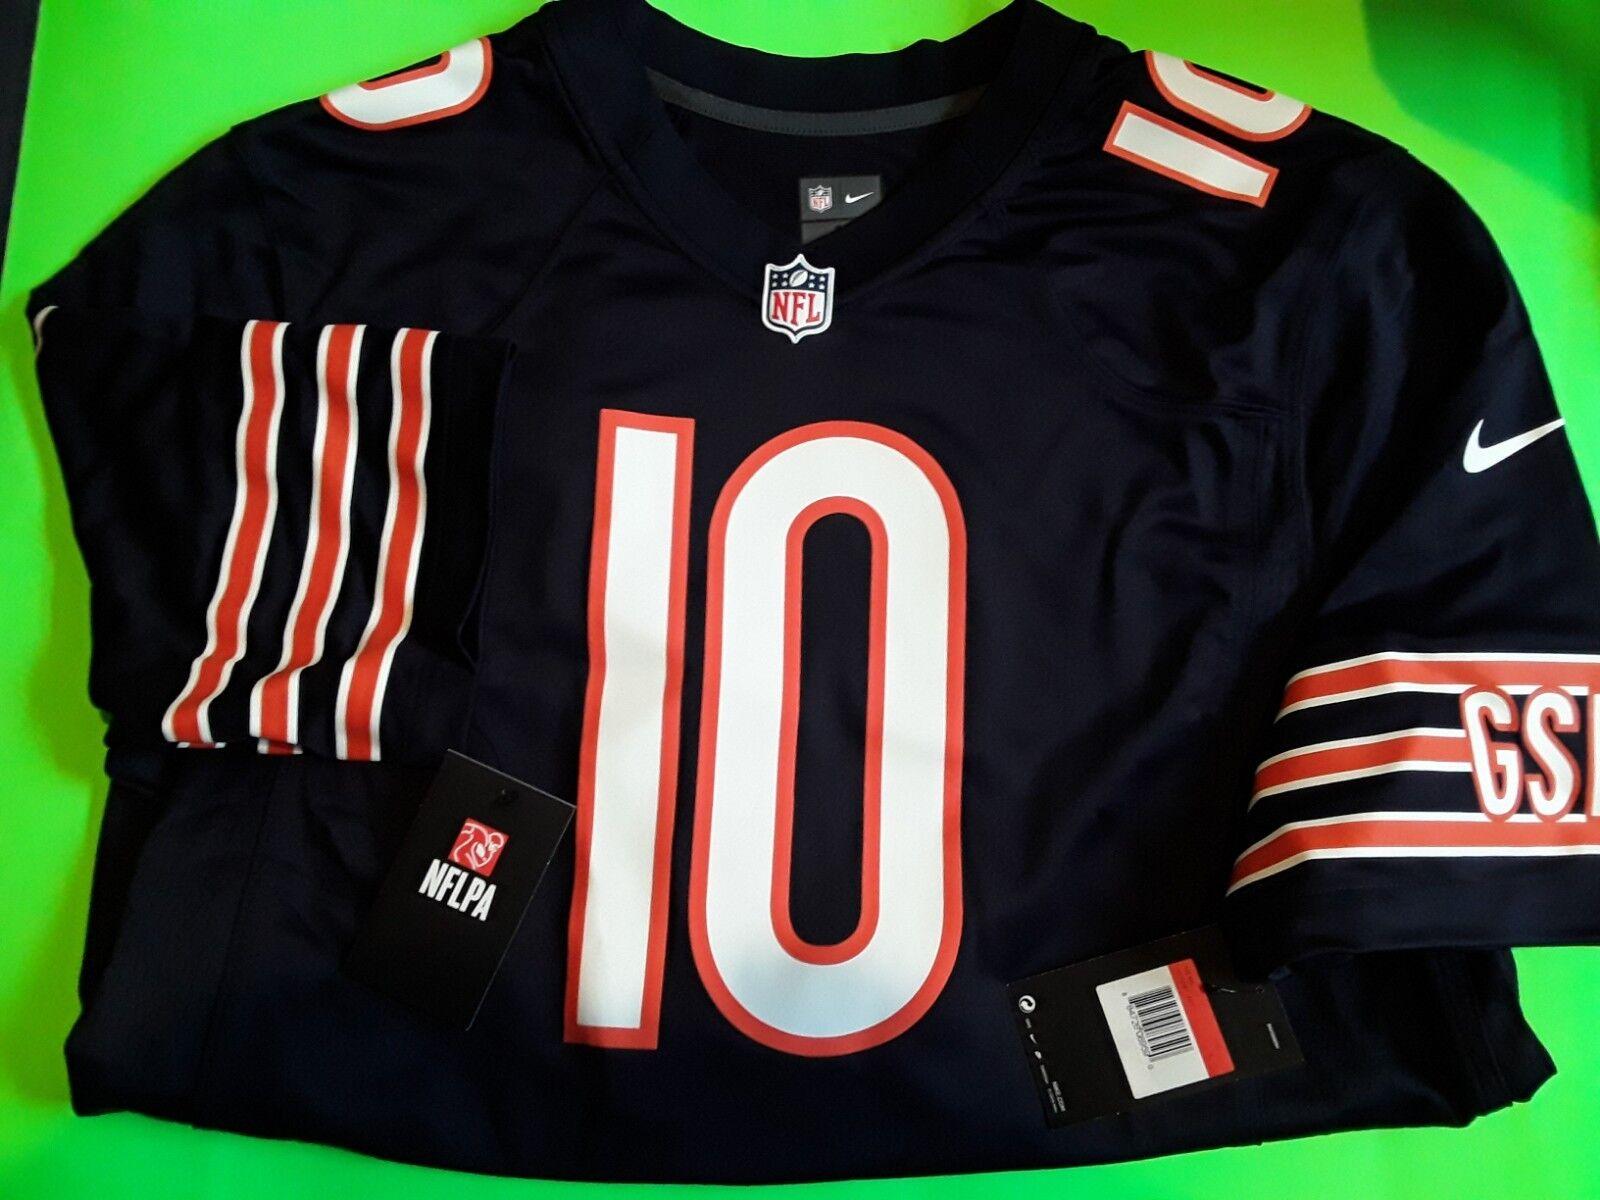 a5e228fc NFL Nike Chicago Bears Mitchell Trubisky #10 Football Adult Men's 2xl  Jersey L